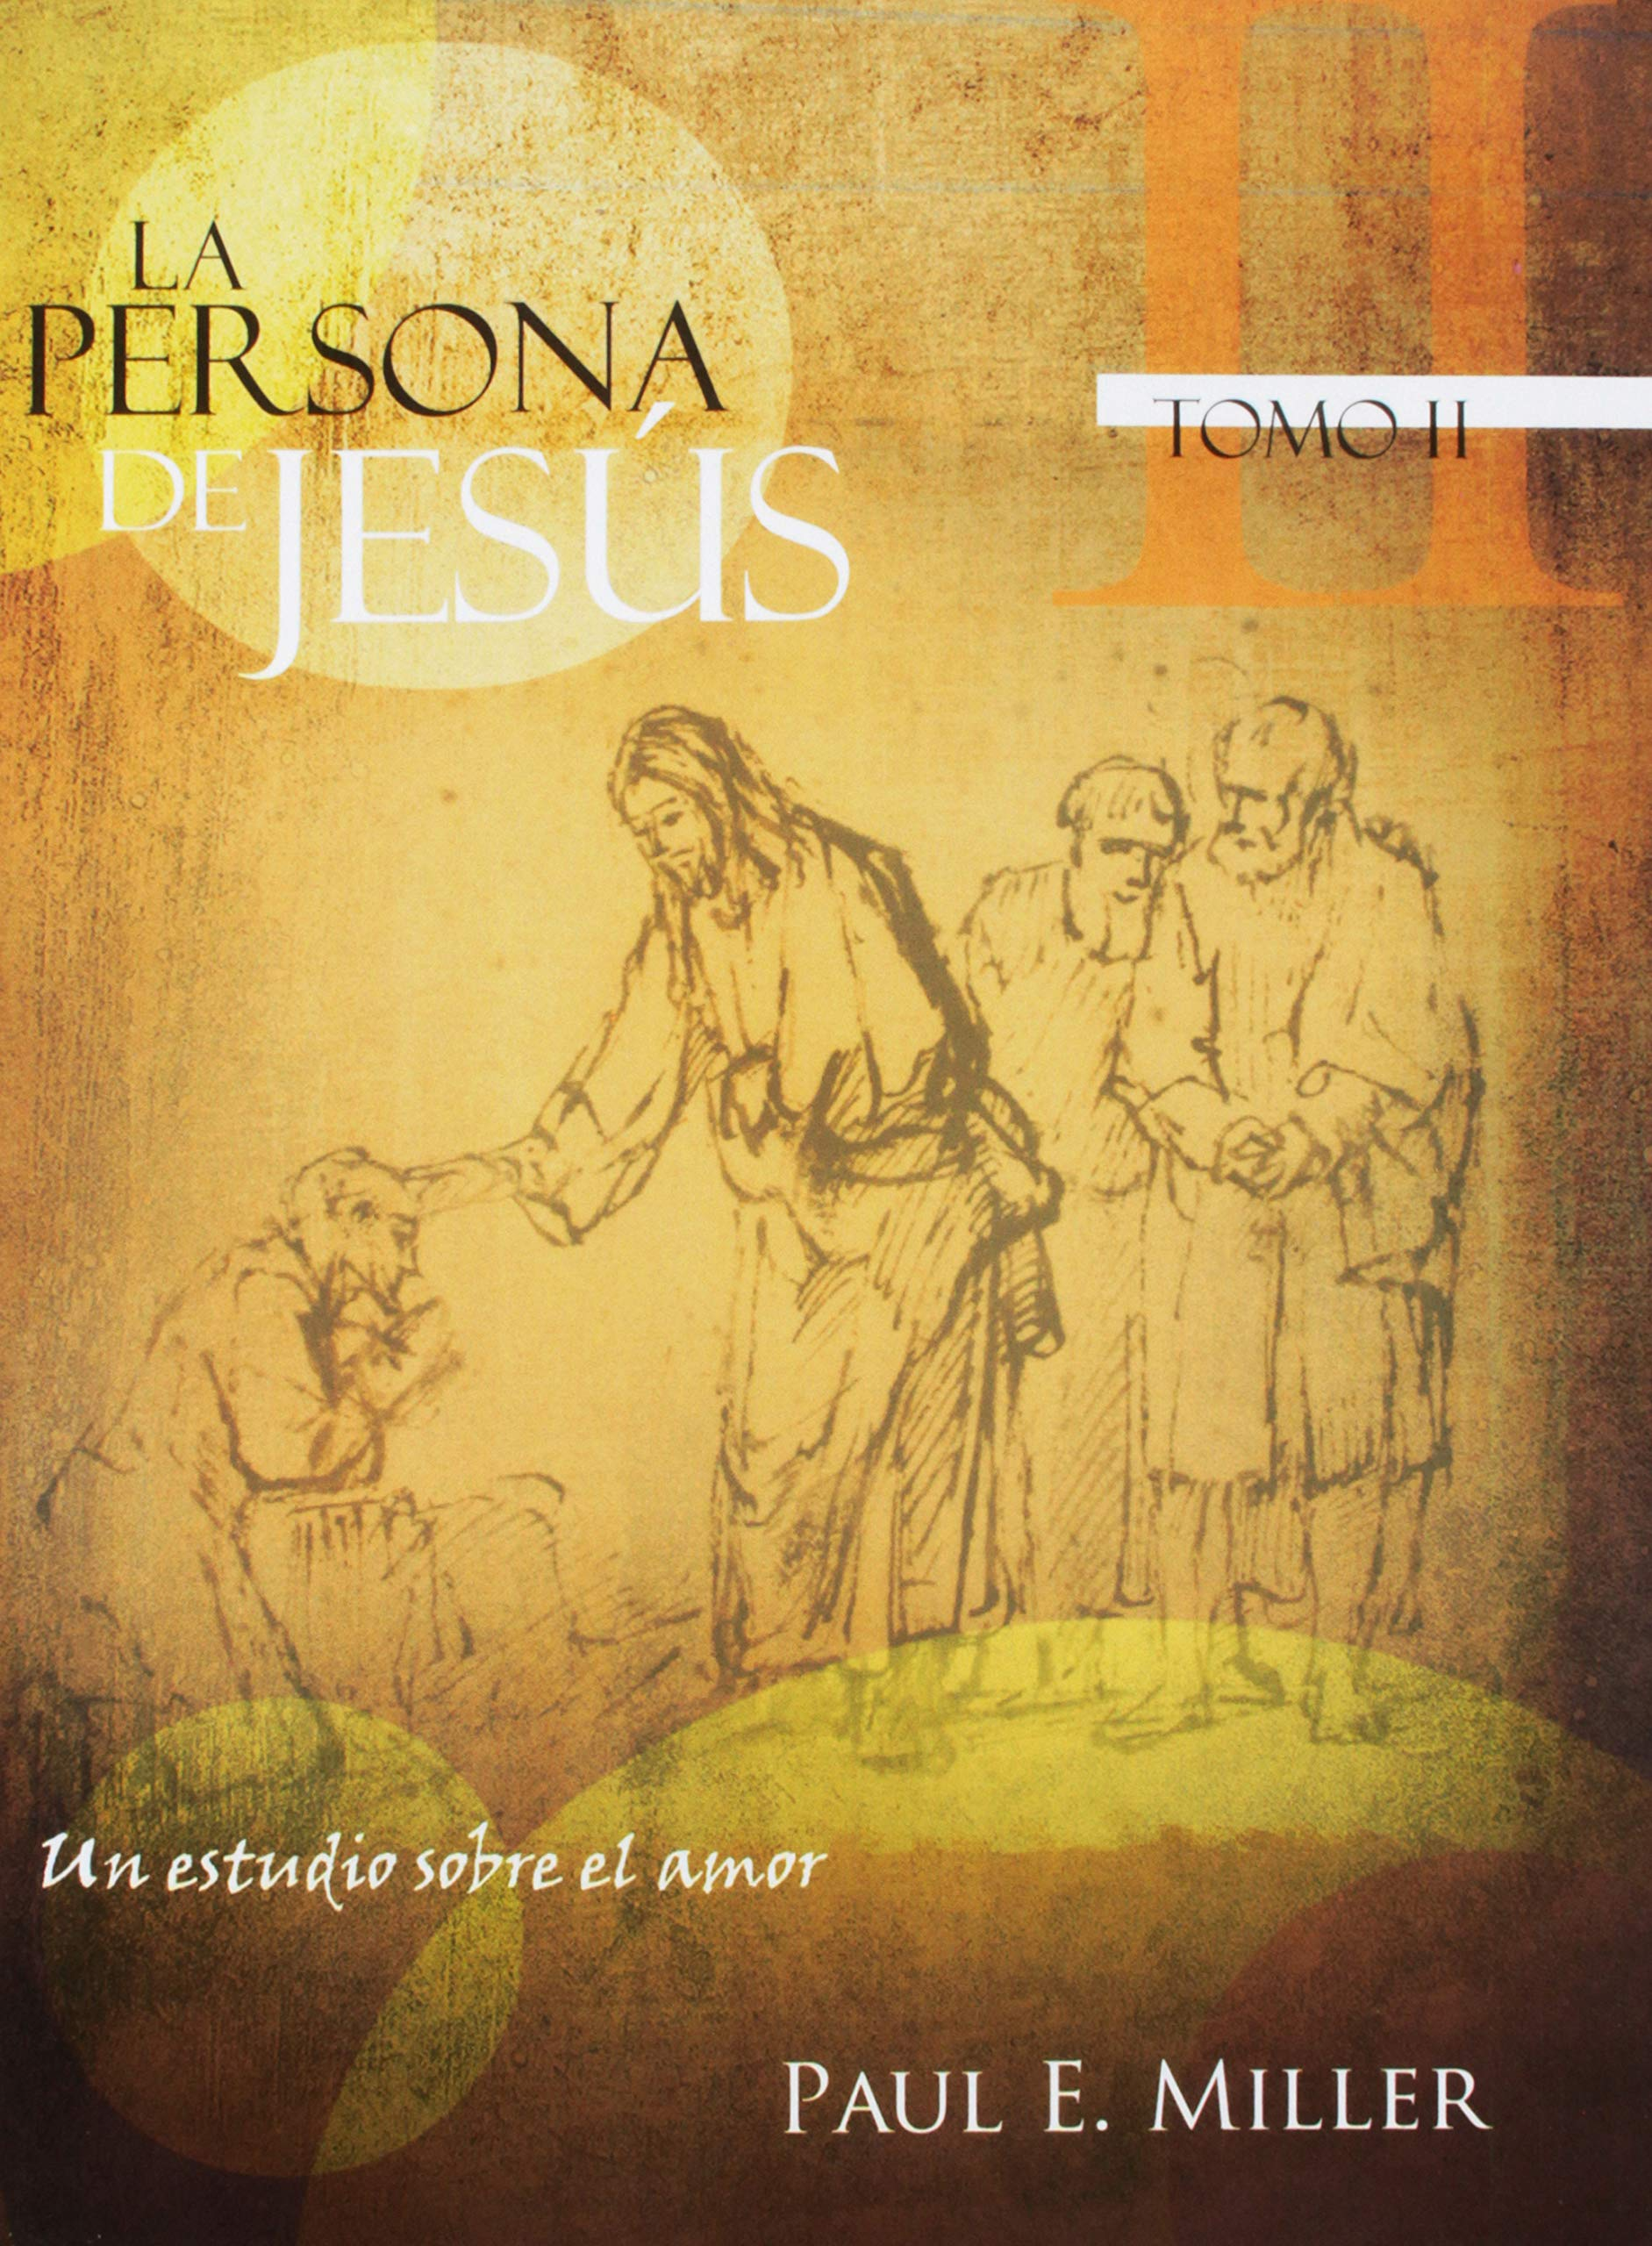 Download Persona de Jesús (Tomo 2) (Spanish Edition) PDF